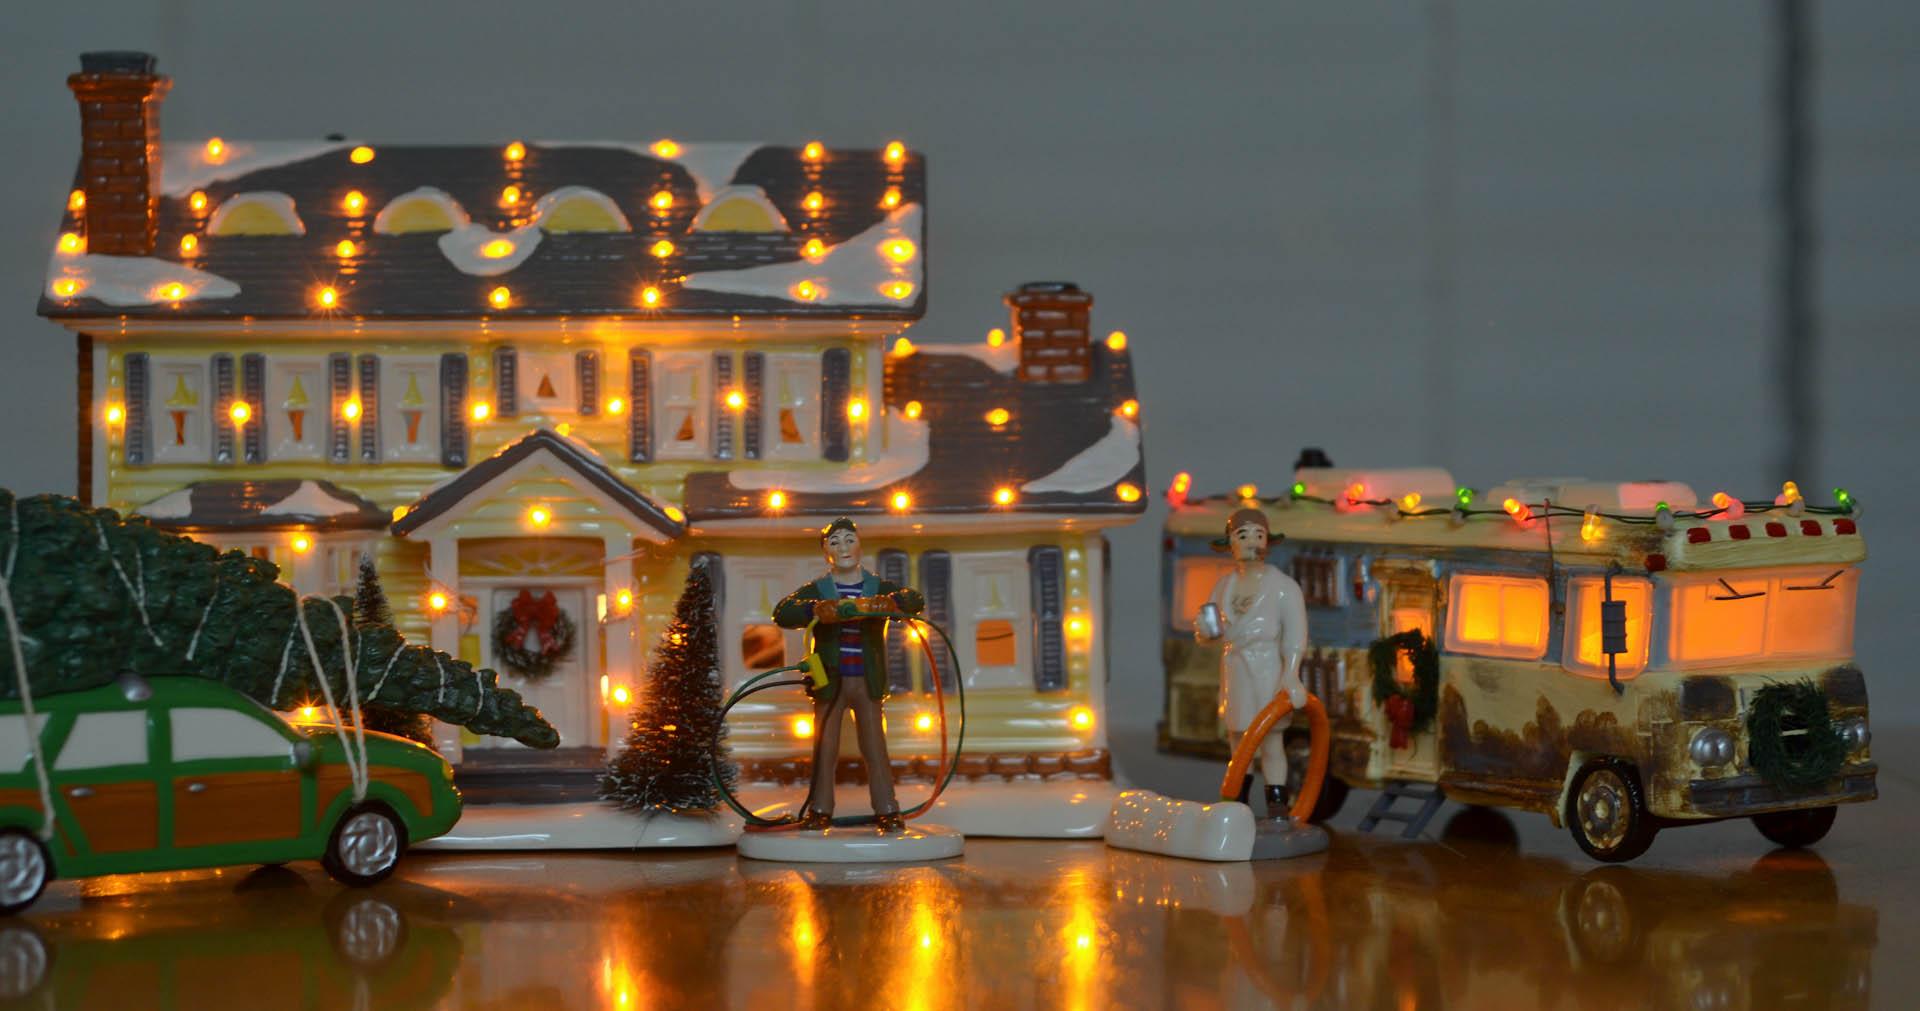 NATIONAL-LAMPOONS-CHRISTMAS-VACATION national lampoon ...